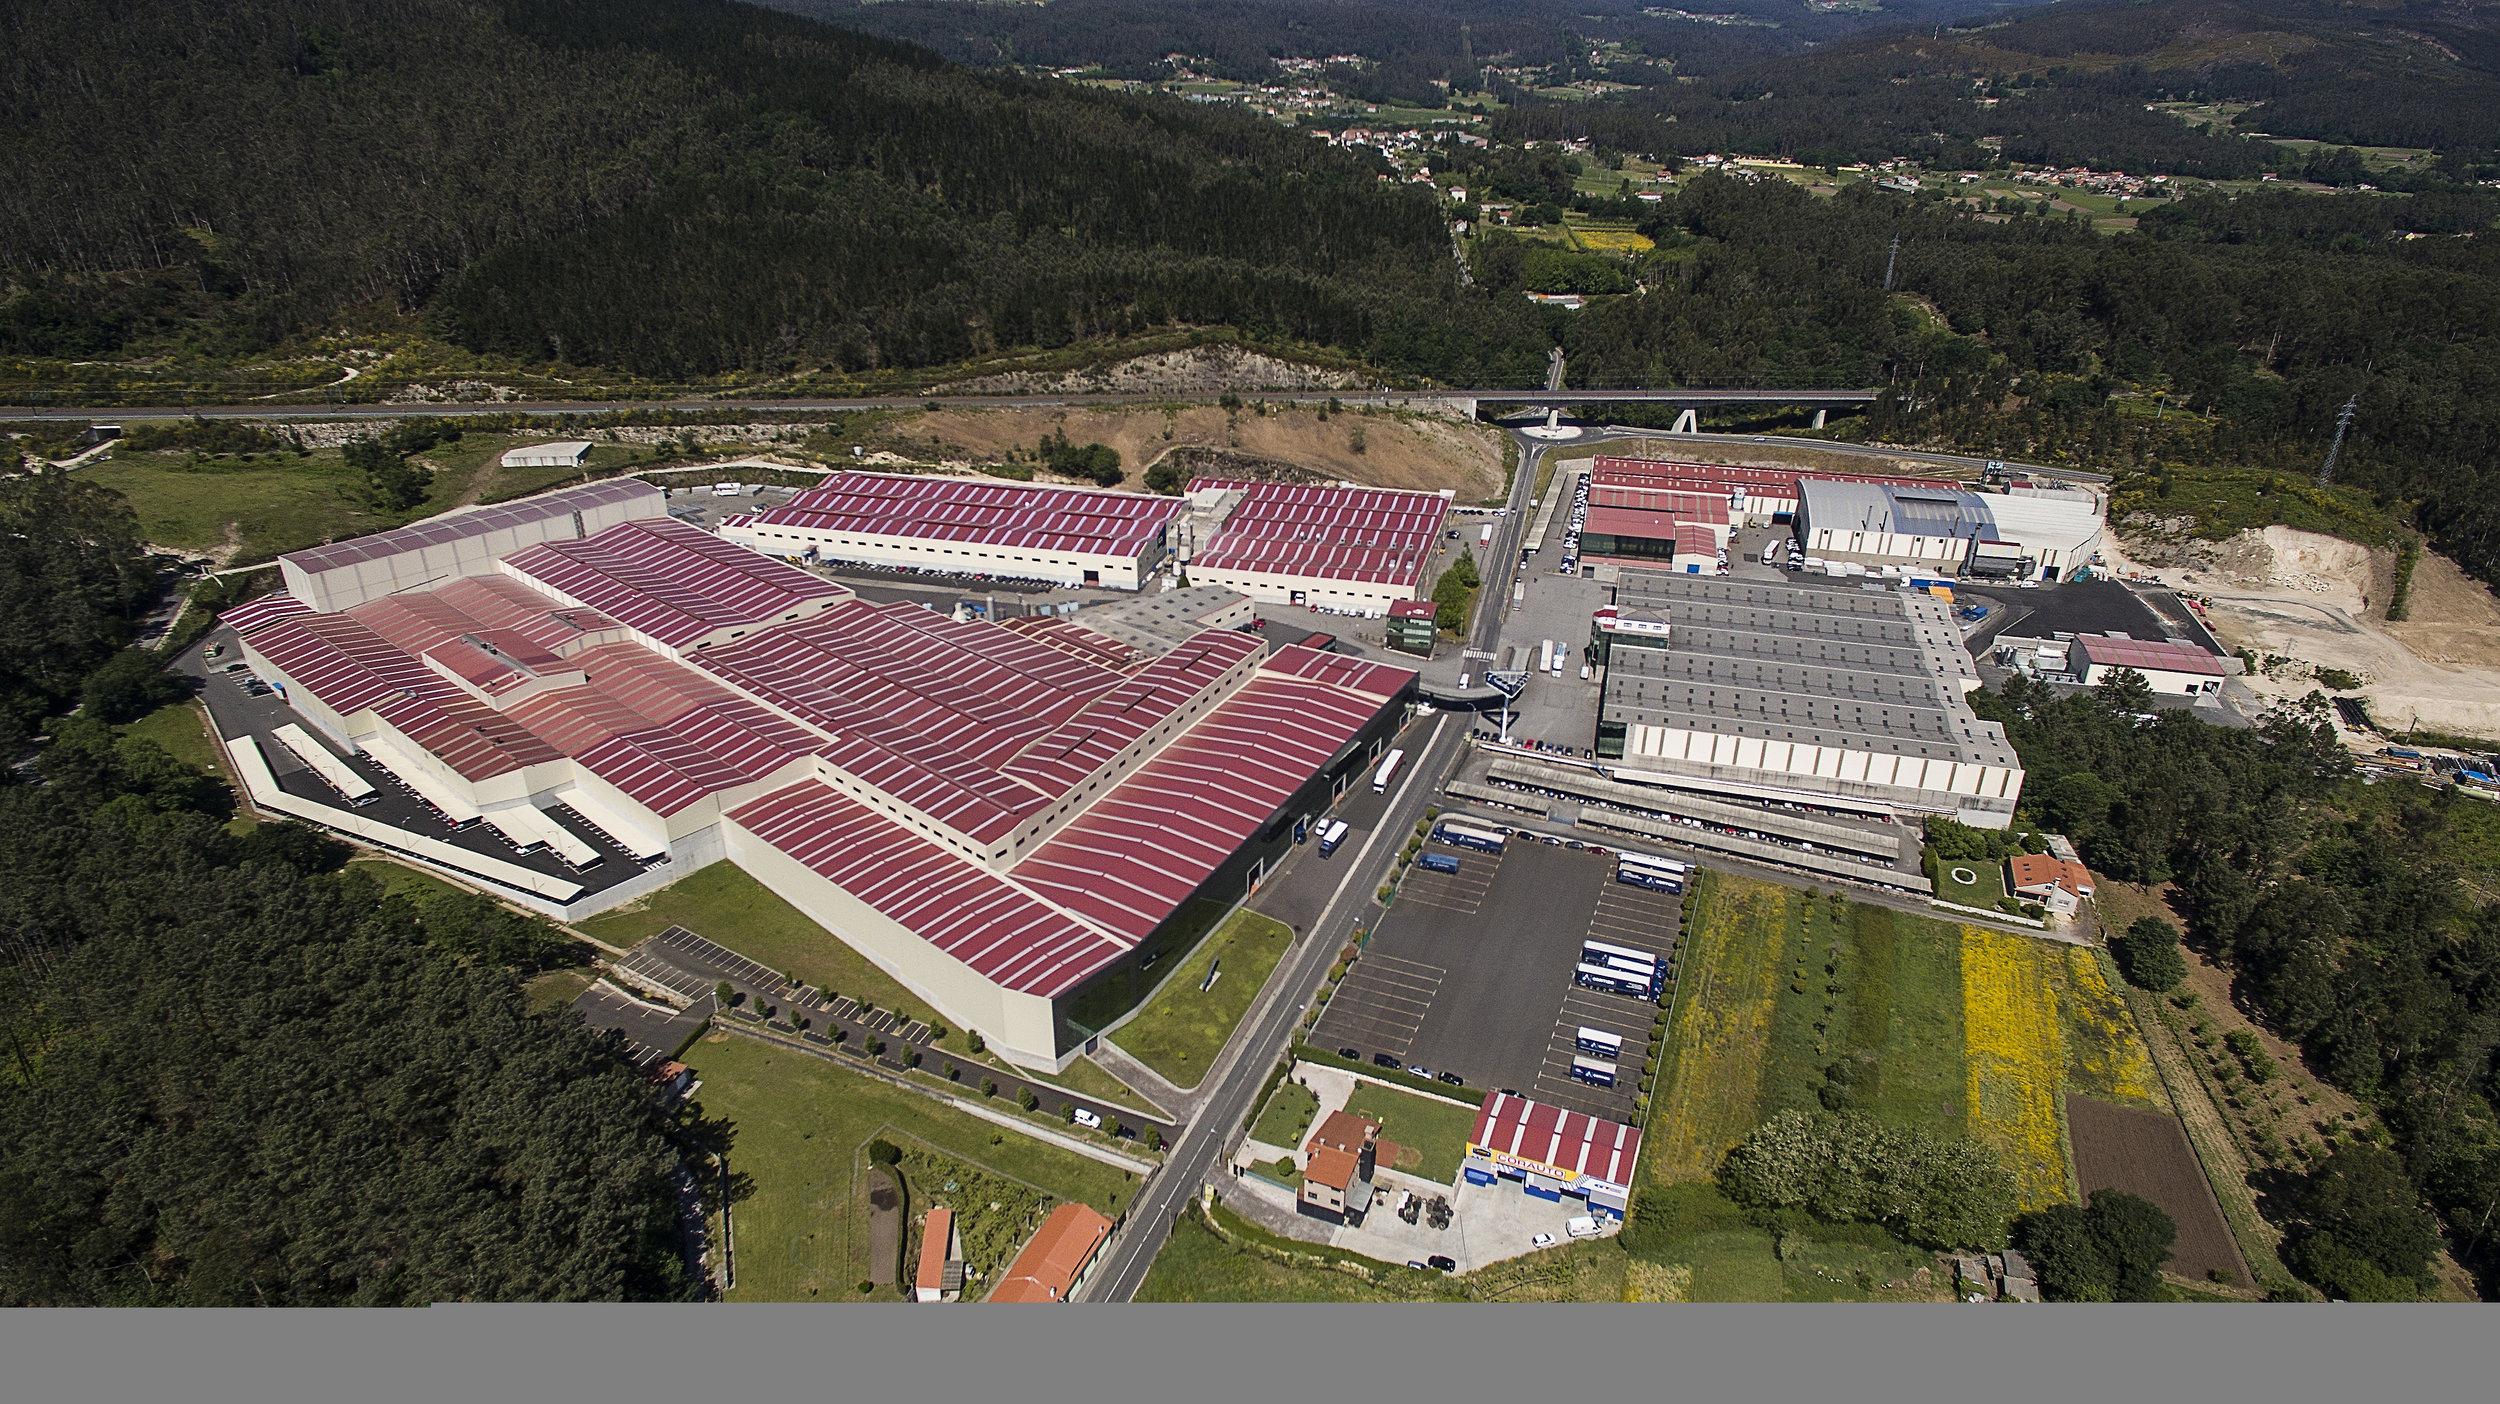 Cortizo HQ, Padrón, A Coruña